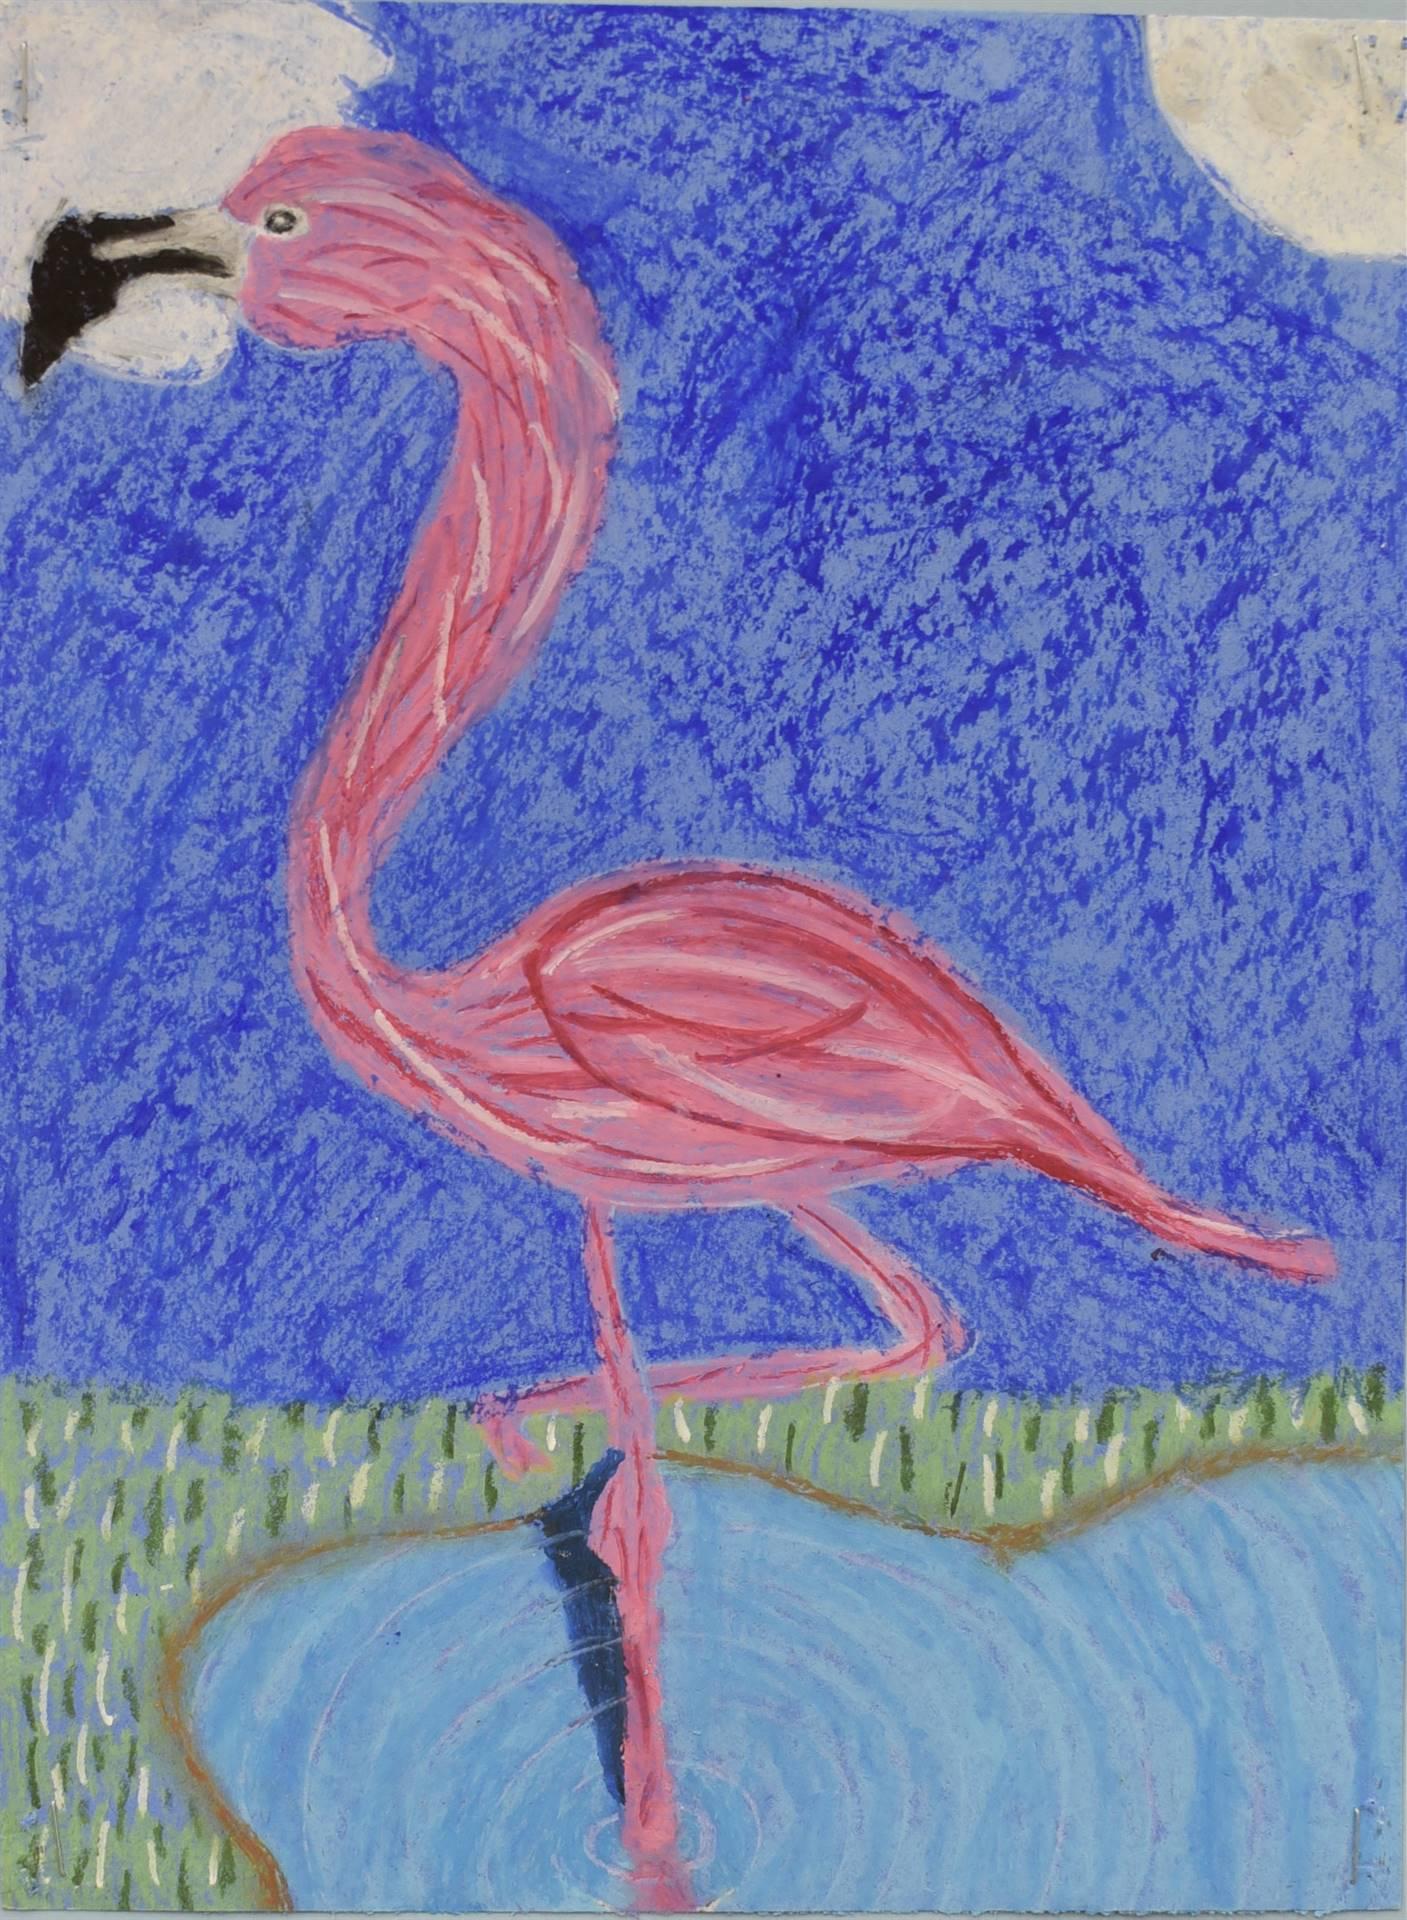 Brecksville-Broadview Hts. Middle School Art Projects 113